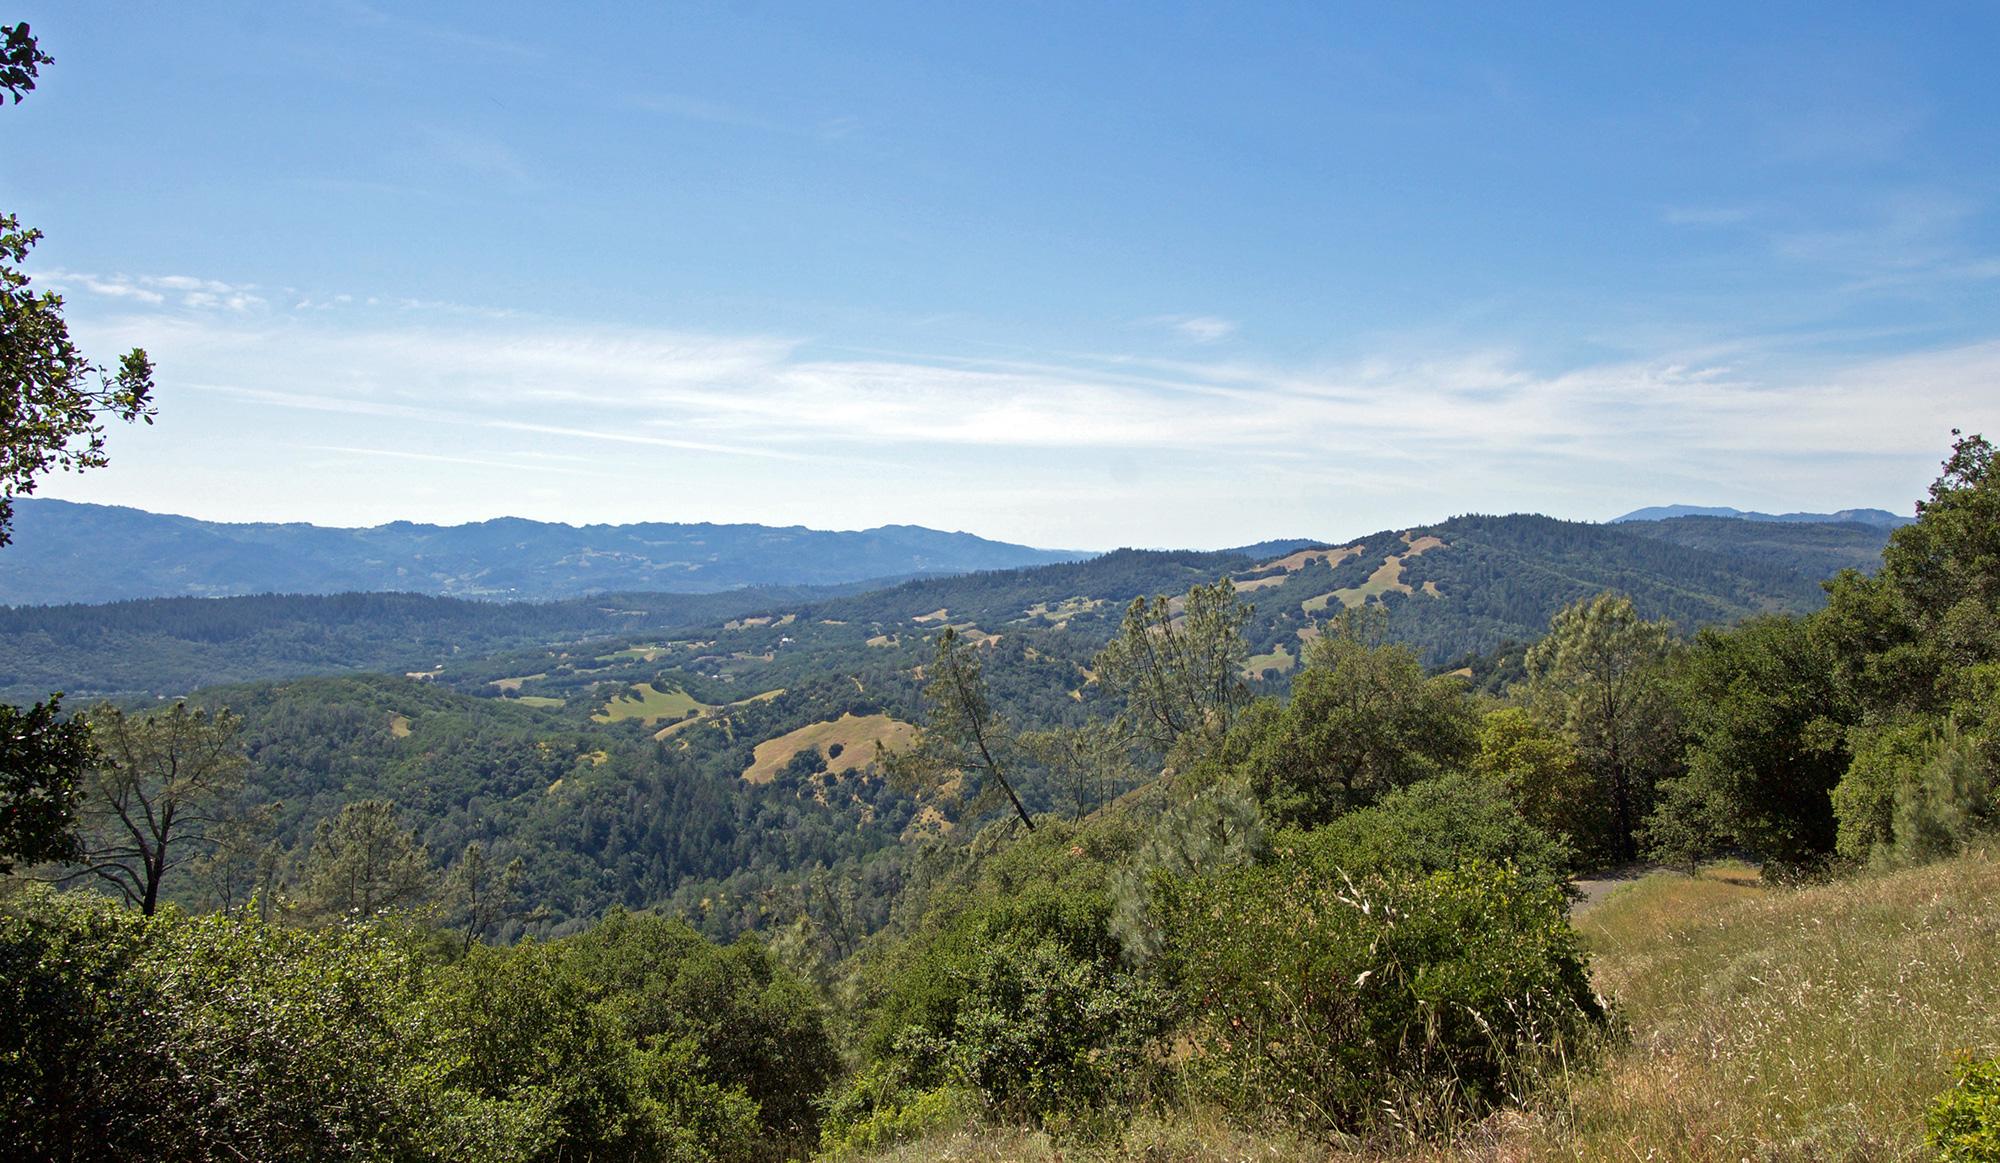 Afternoon Views of Napa Valley Mounatins